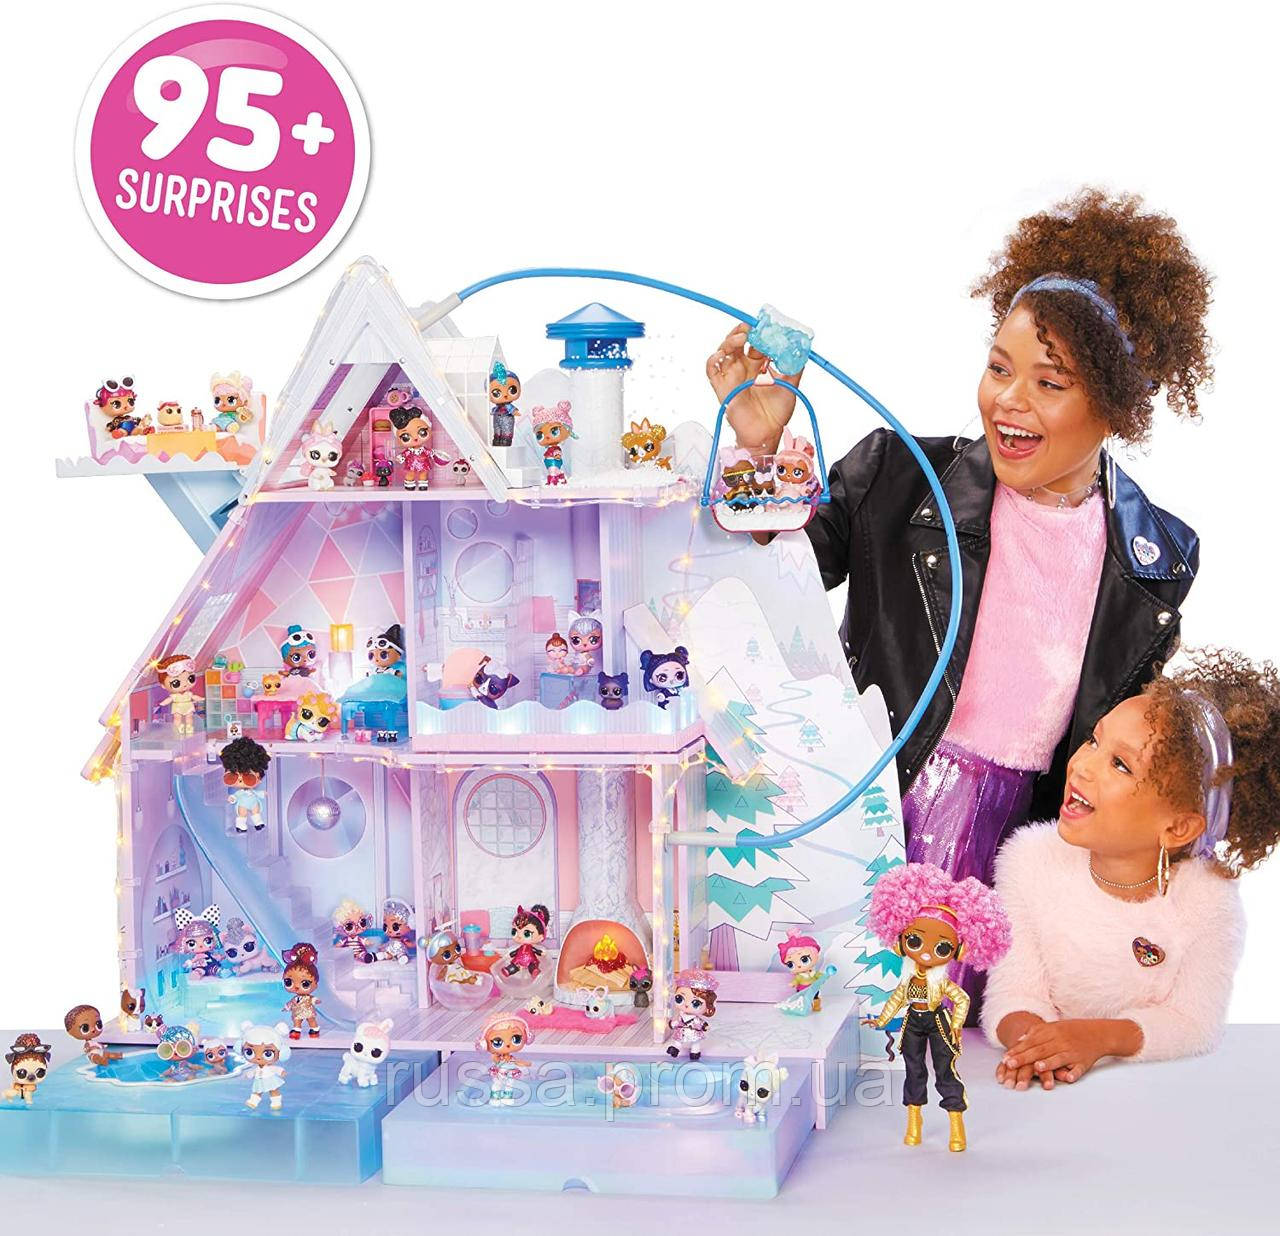 L.O.L. Surprise! Winter Disco Chalet Wooden Doll House (с семьей и камином!) / ЛОЛ Зимний особняк Зимнее Шале